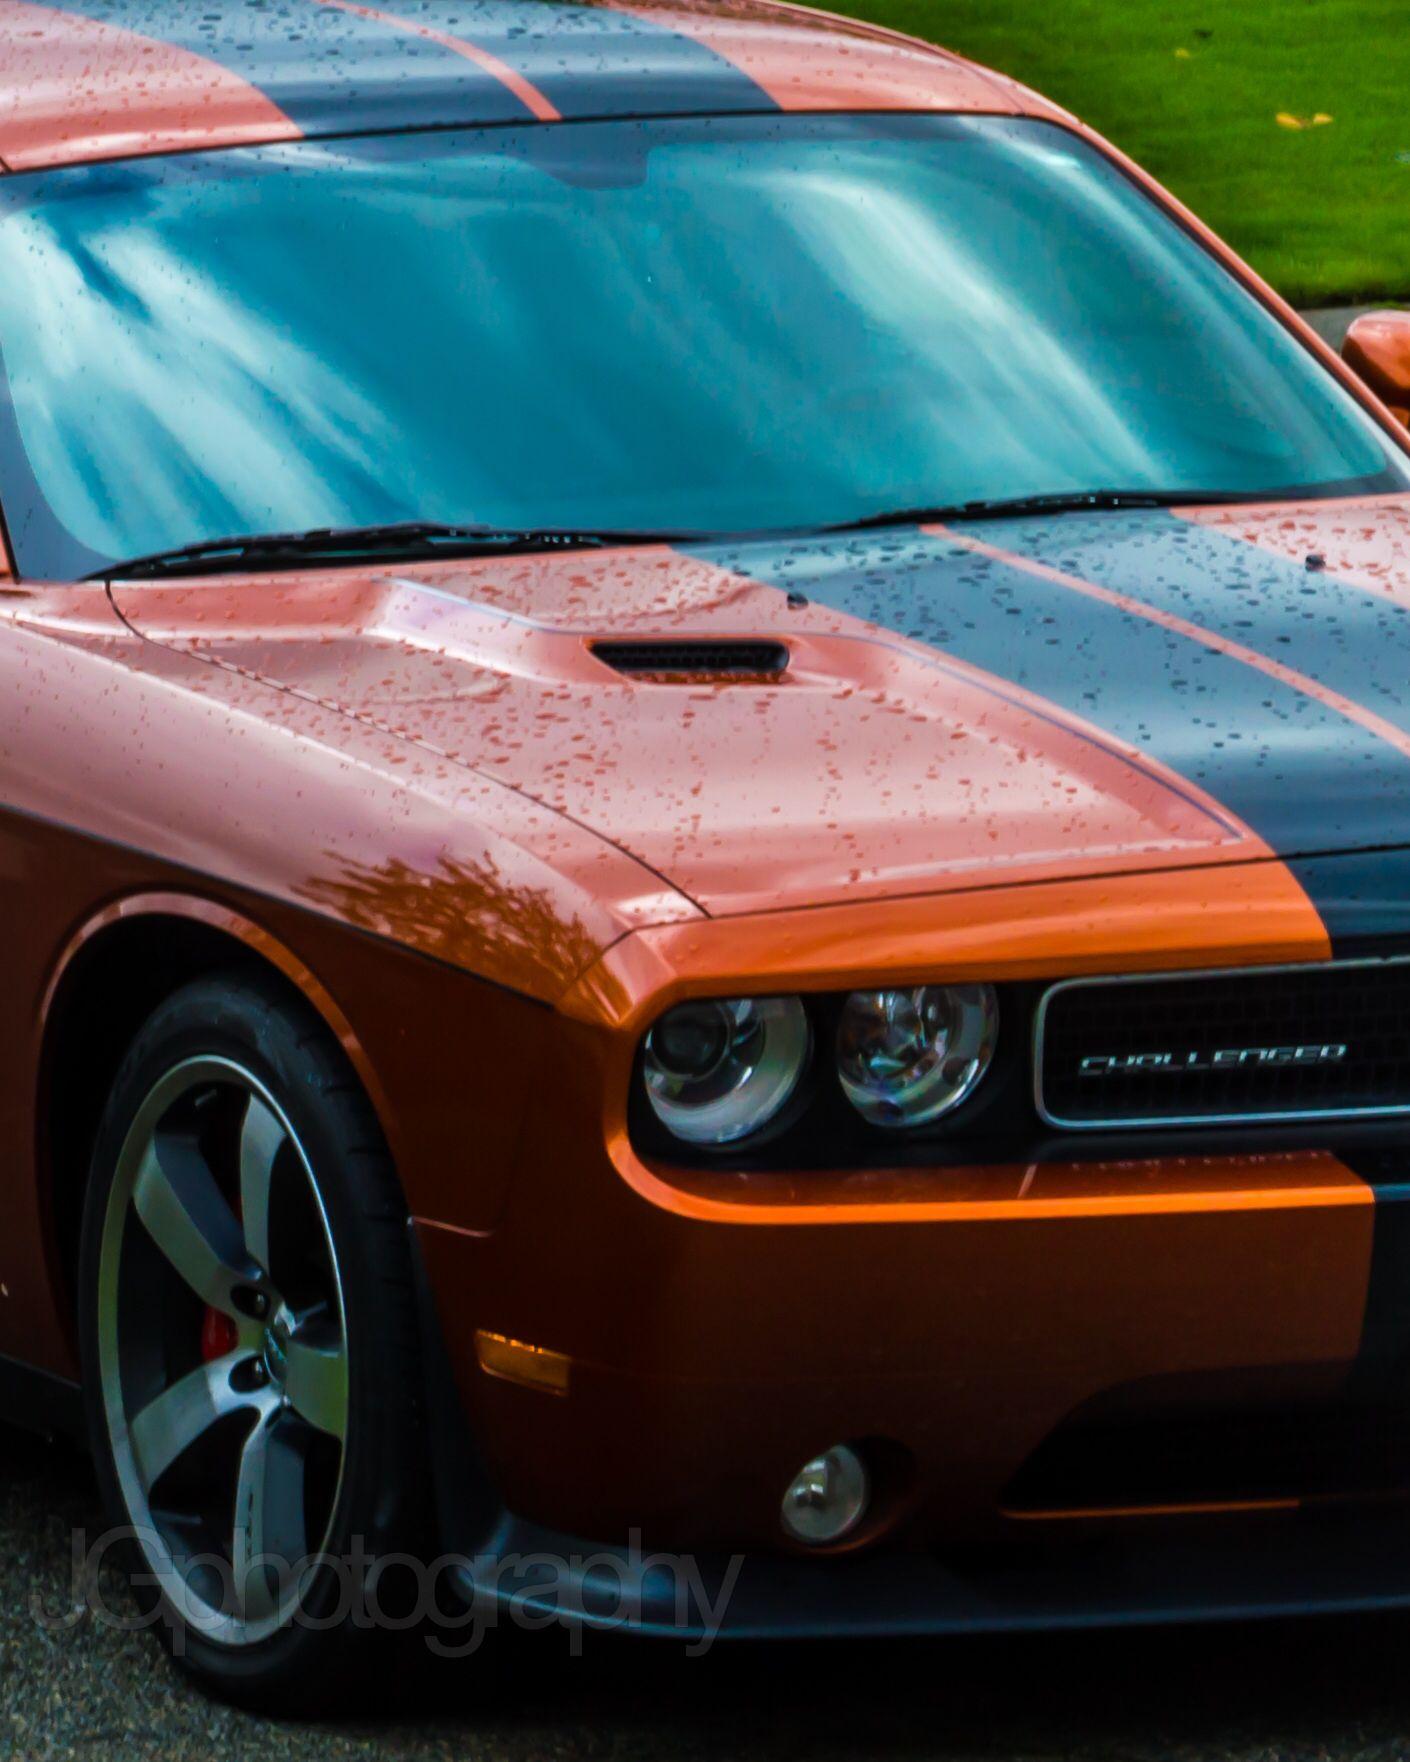 2011 Challenger Srt8 6 4l Hemi 392 W 470 Hp Burnt Orange W Rally Stripes Carros